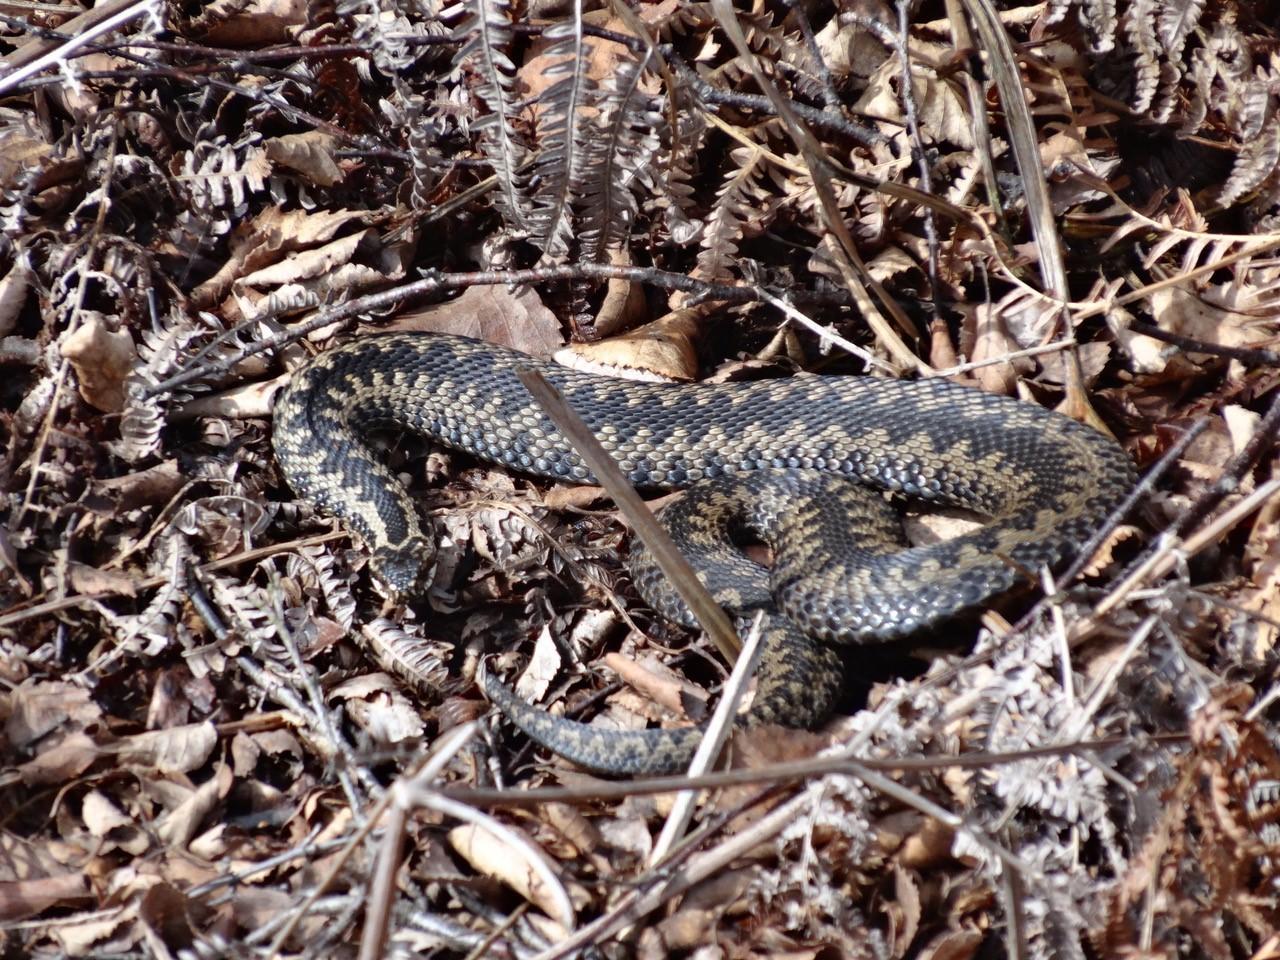 Common European Adder (Vipera berus), Hatfield Moor.